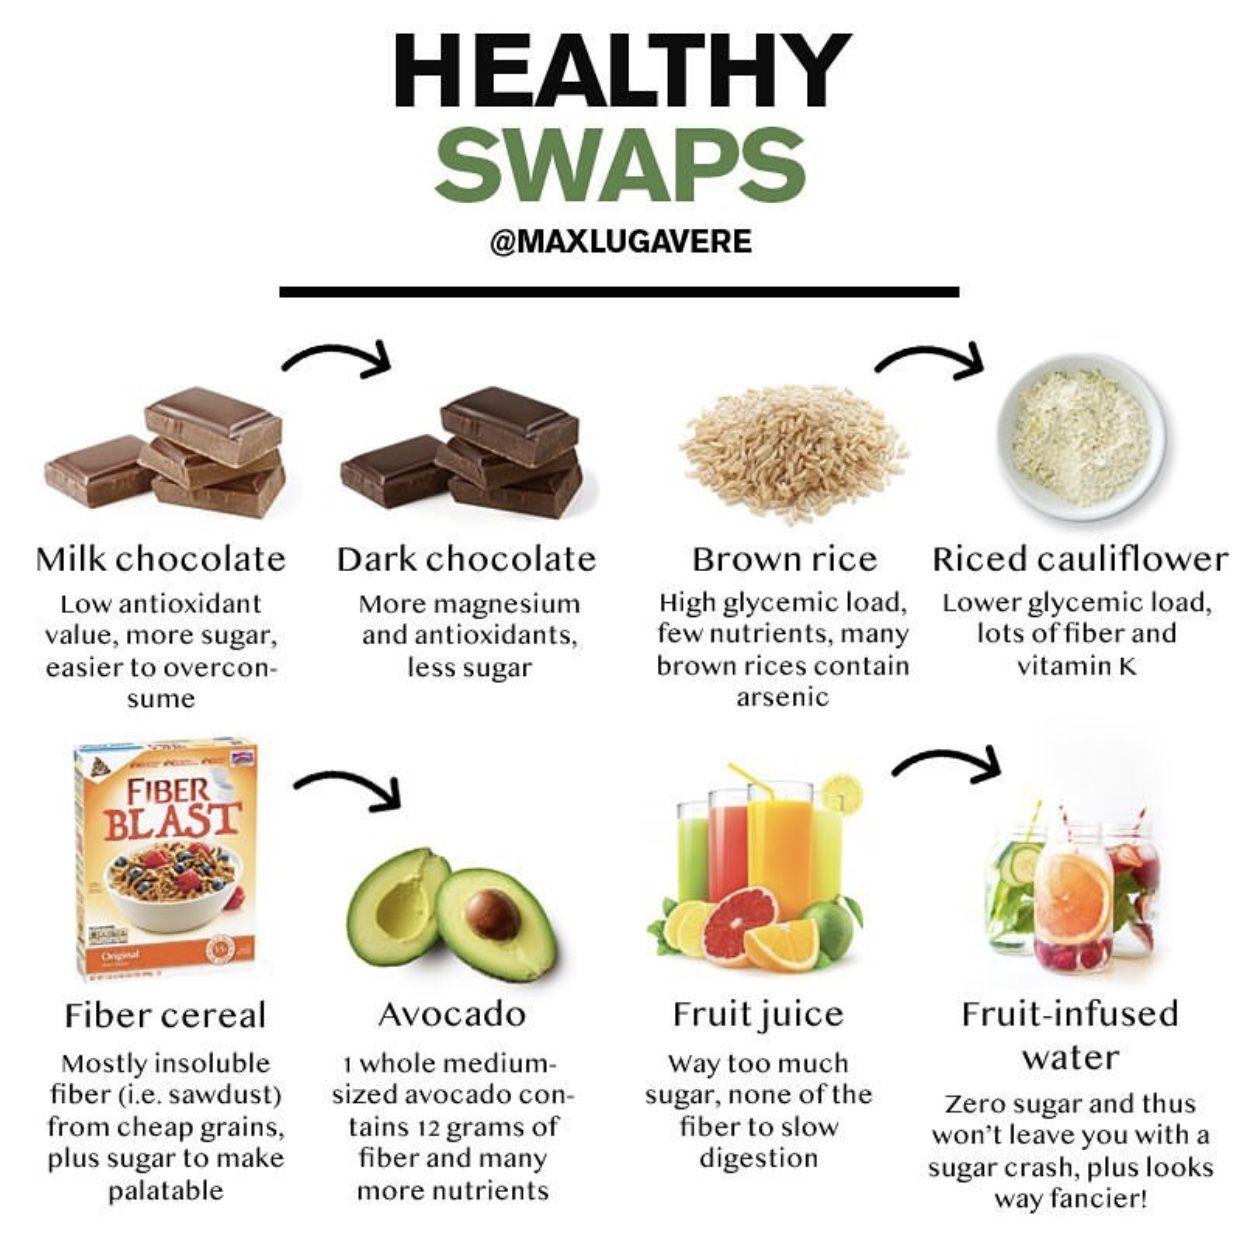 Healthy, Food, Fiber Cereal